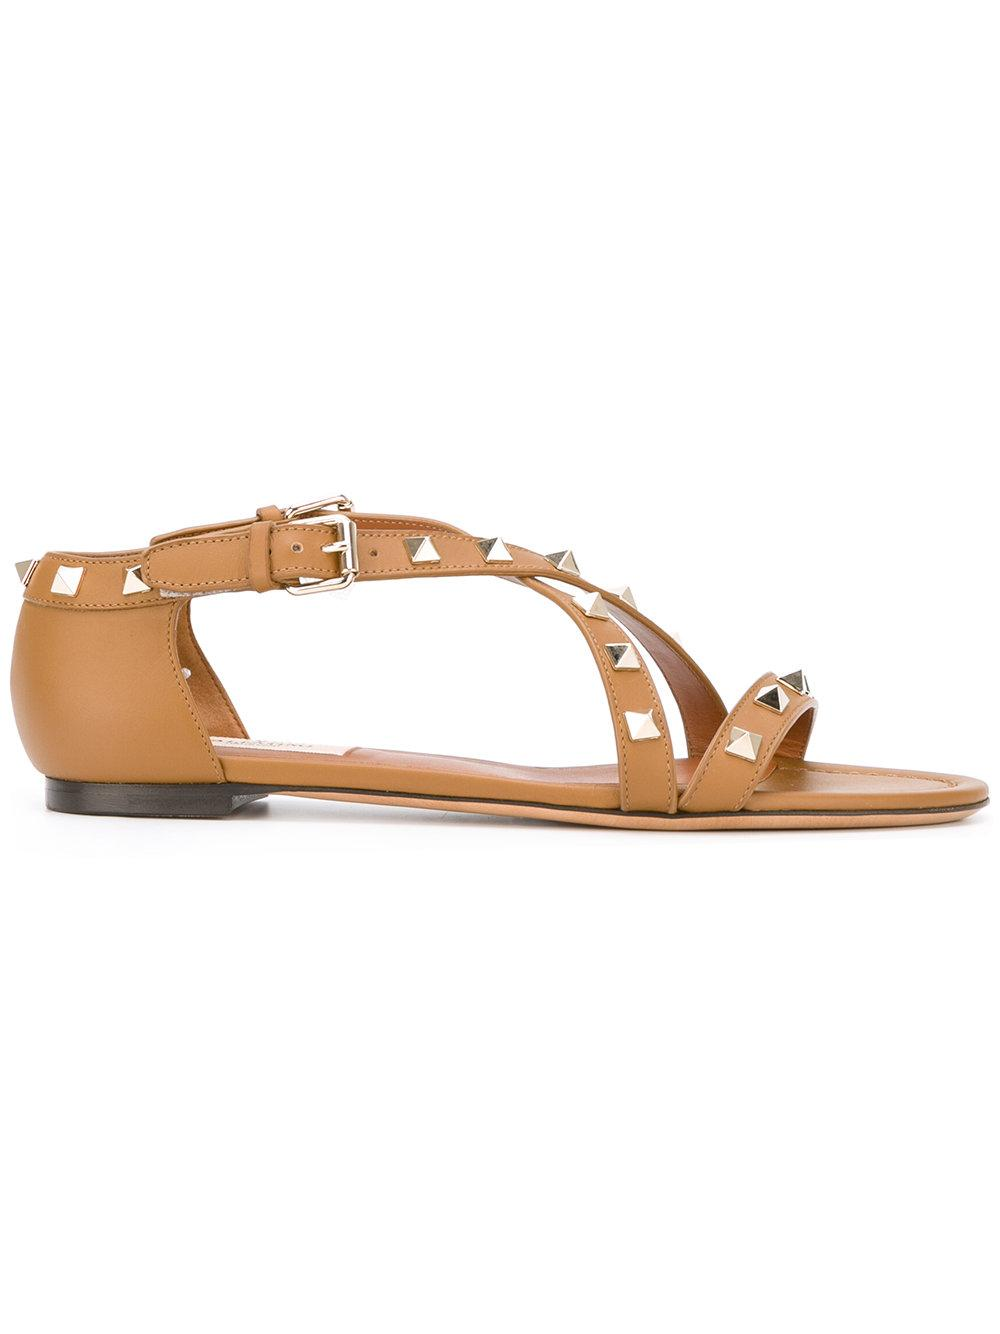 Lyst Valentino Garavani Rockstud Flat Sandals In Brown